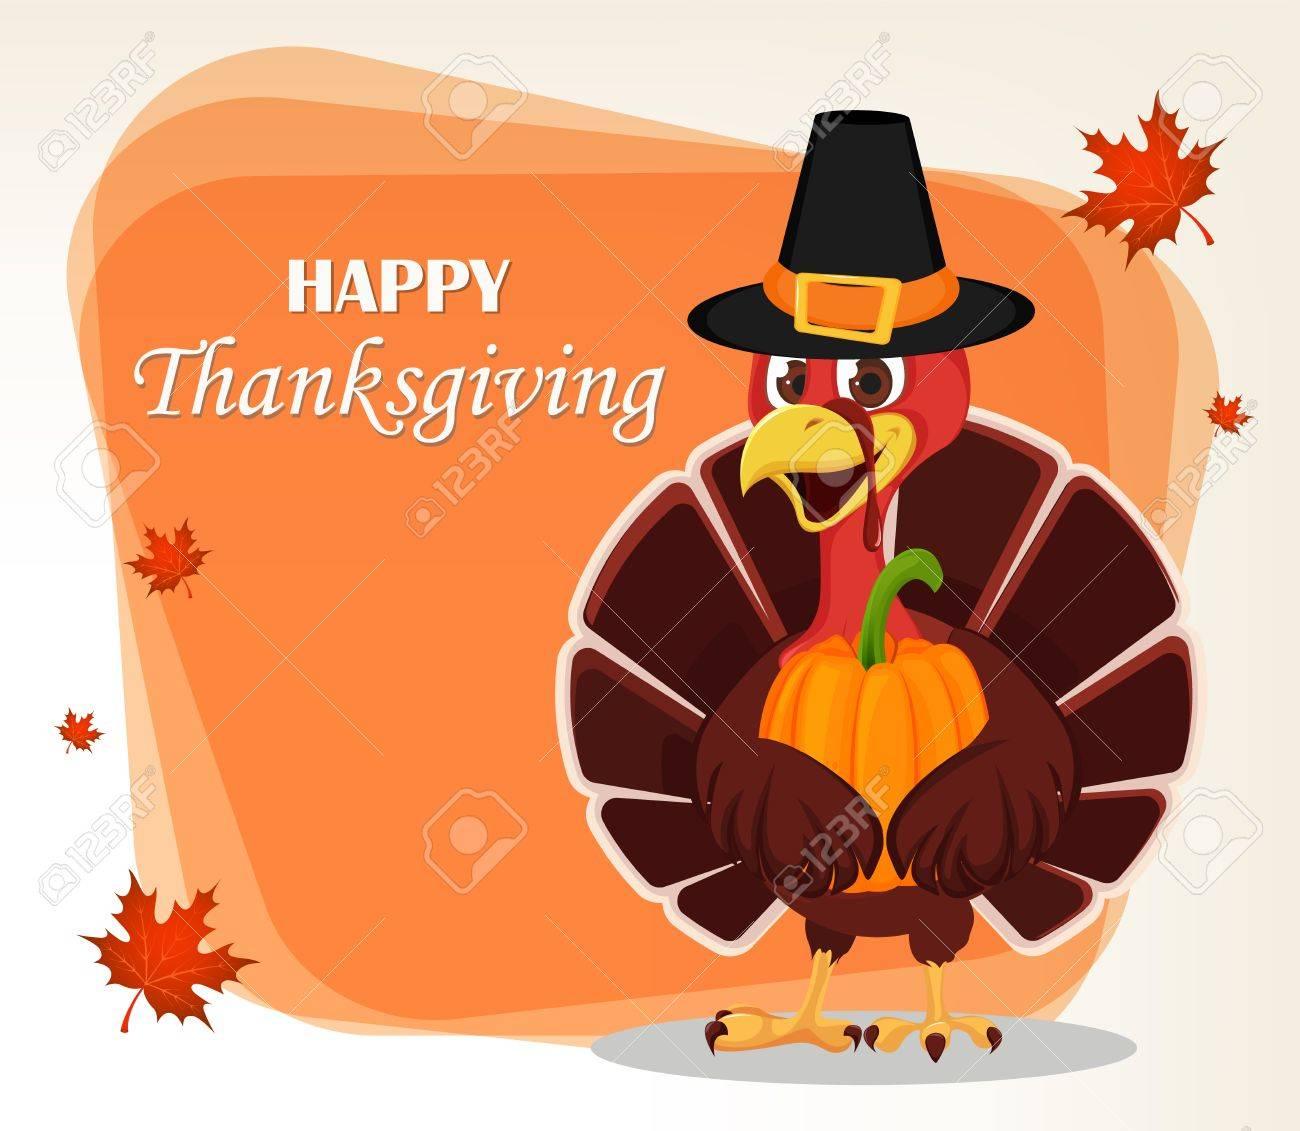 Thanksgiving Greeting Card With A Turkey Bird Wearing A Pilgrim